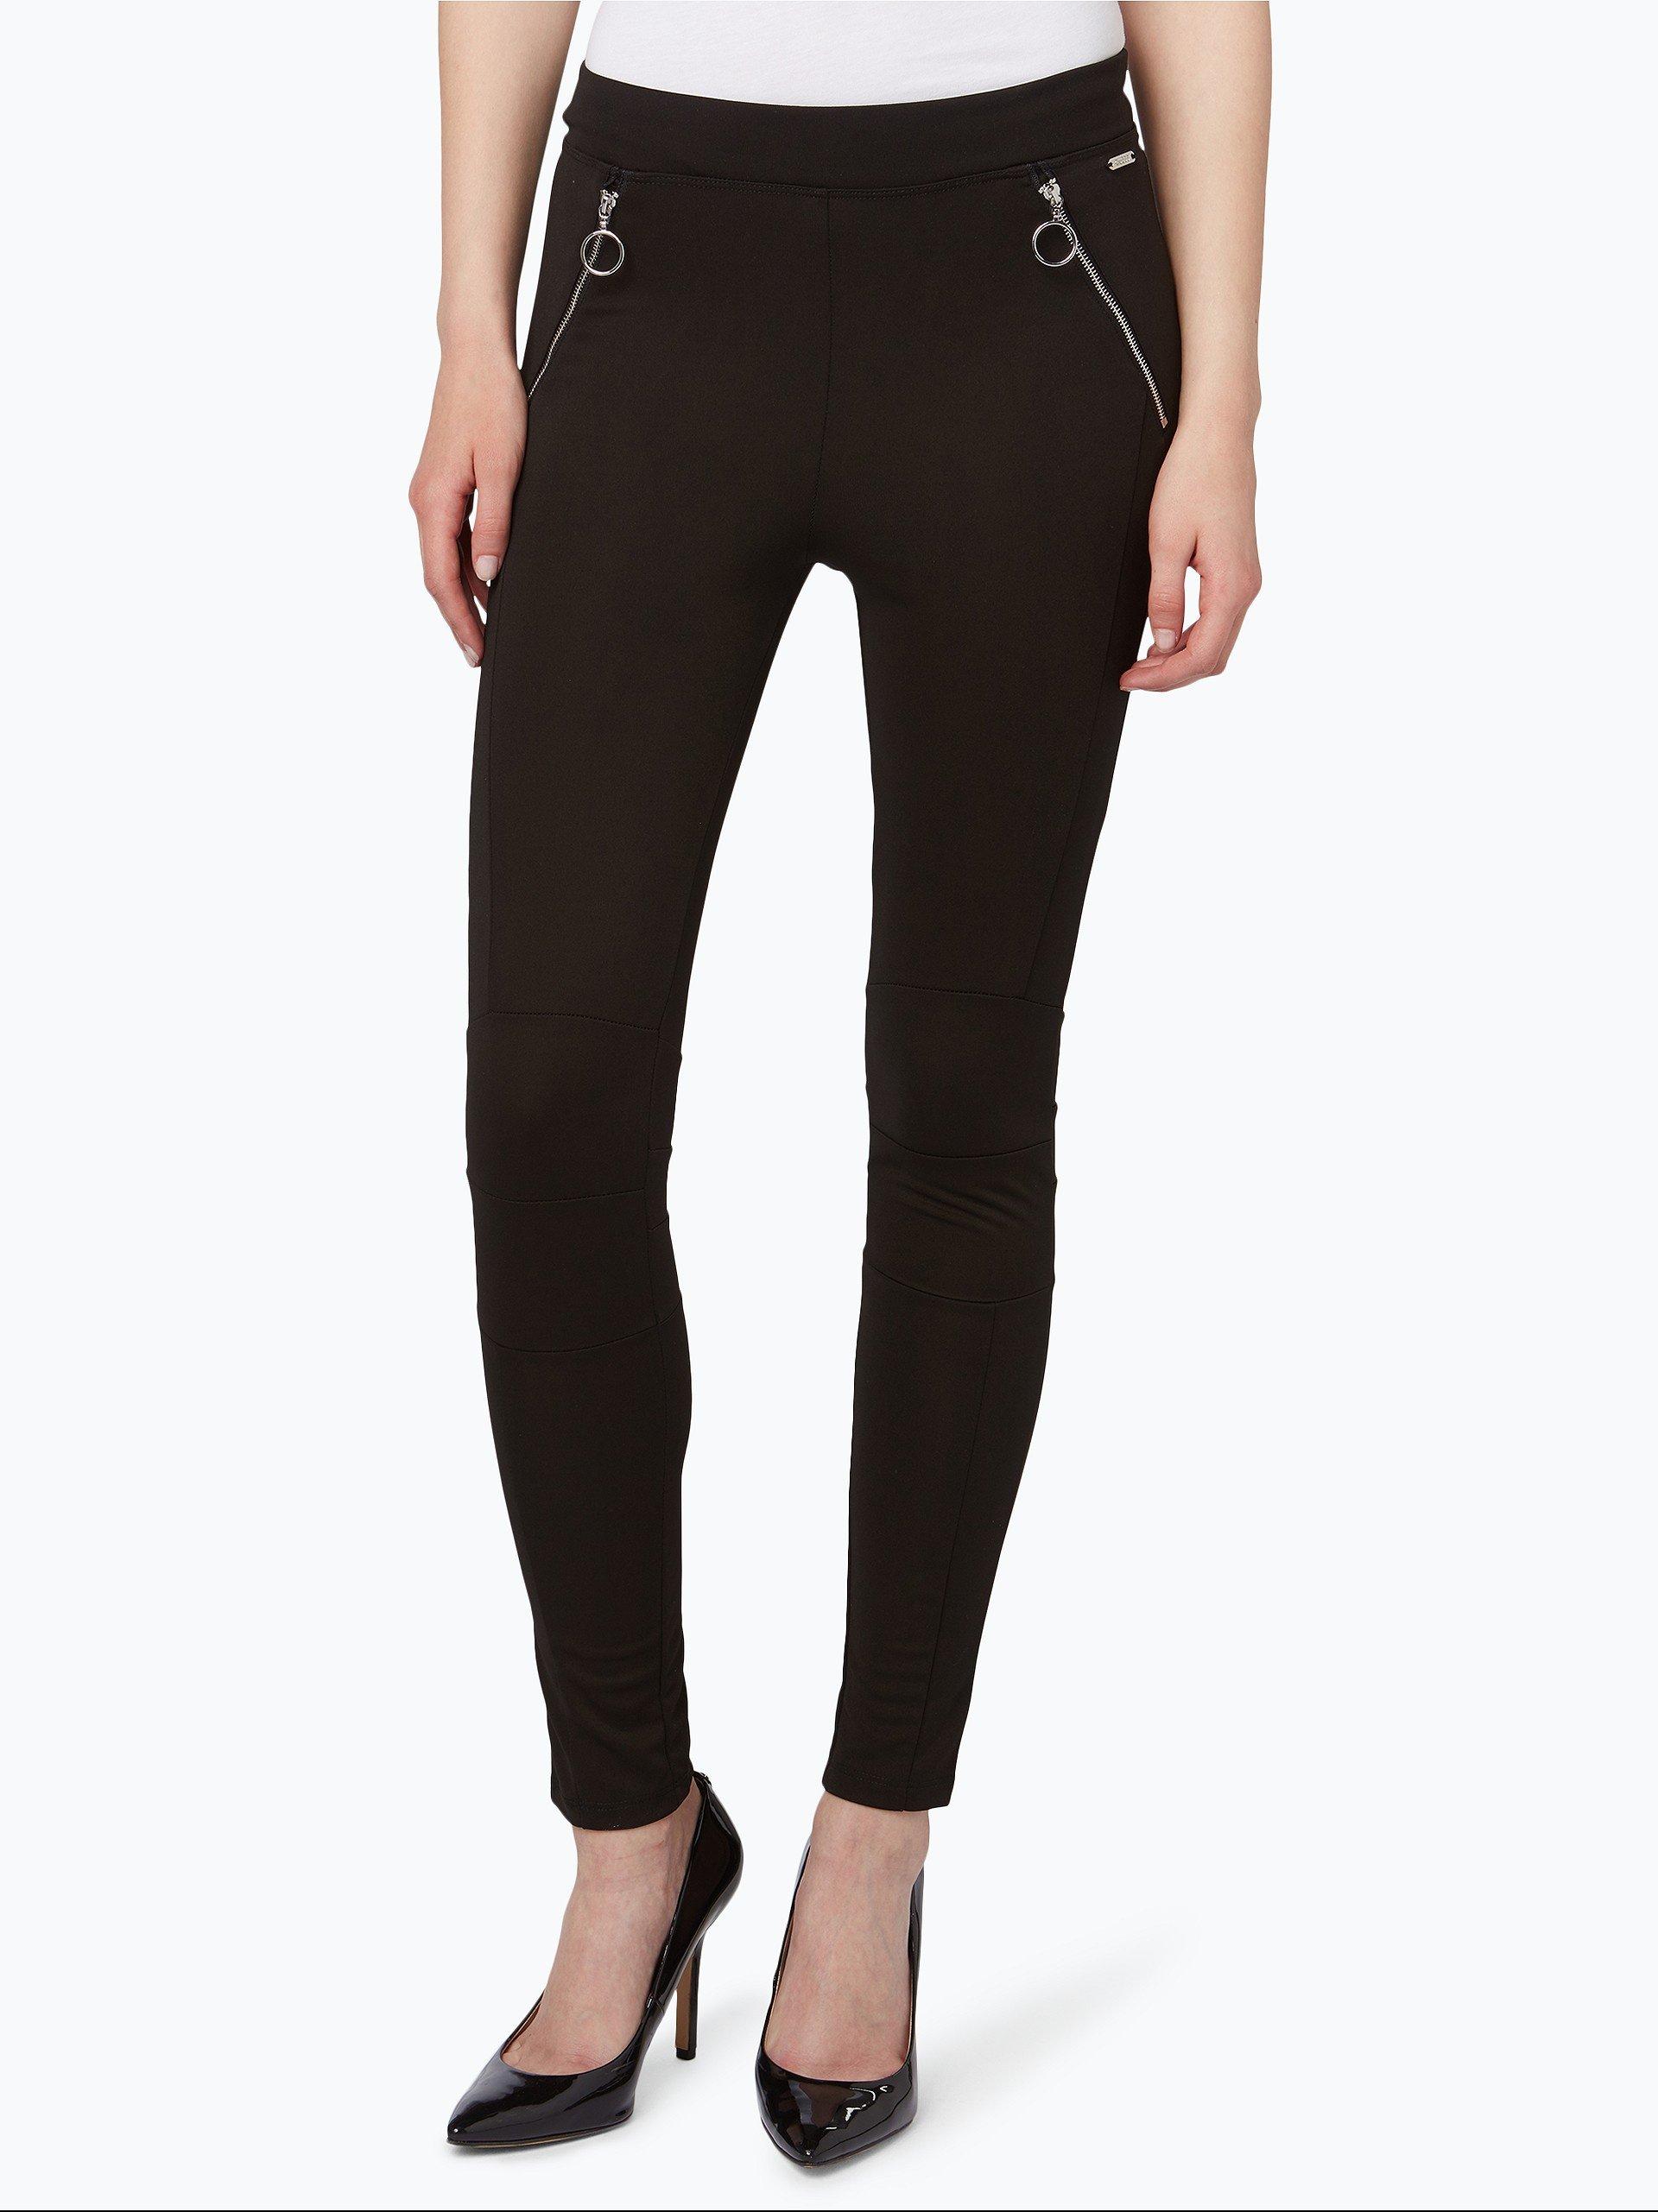 guess jeans damen leggings schwarz uni online kaufen peek und cloppenburg de. Black Bedroom Furniture Sets. Home Design Ideas